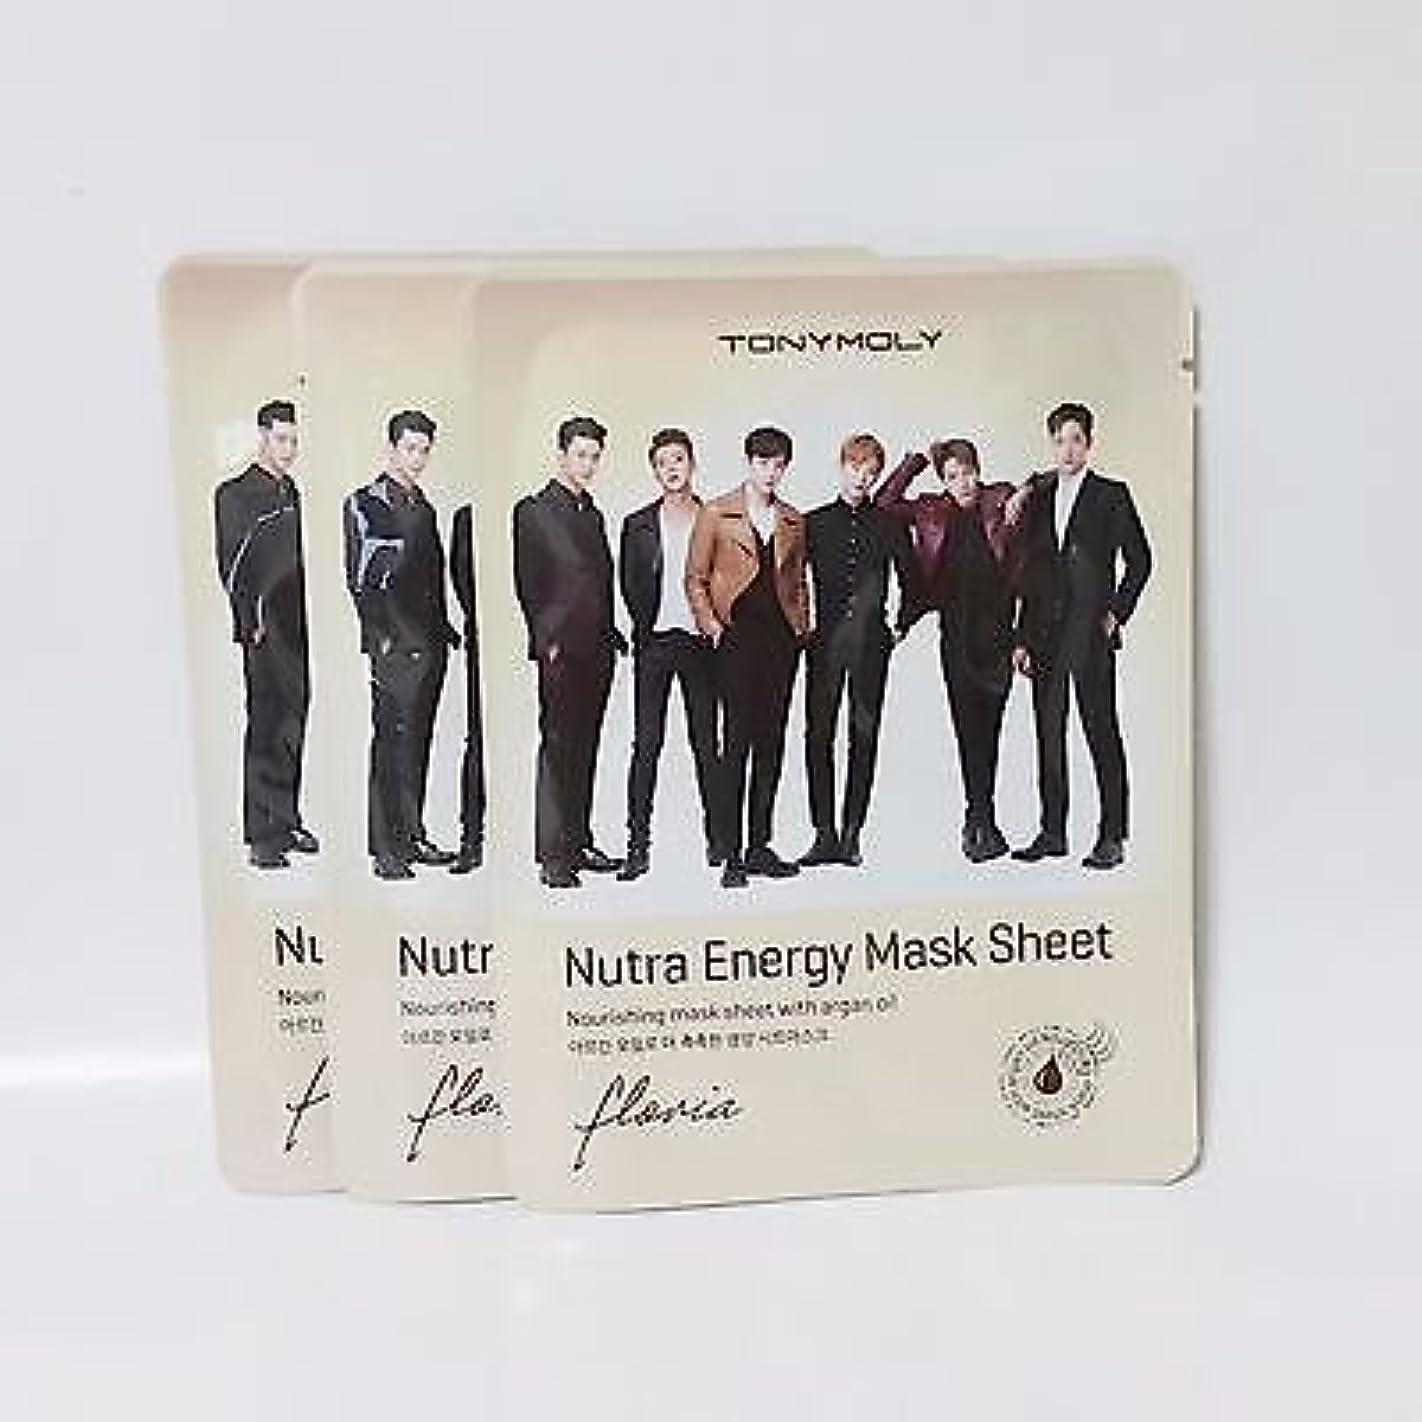 TONY MOLY トニーモリー ニュートラ エナジーマスクシート NUTRA-ENERGY MASK SHEET (20g) [並行輸入品]